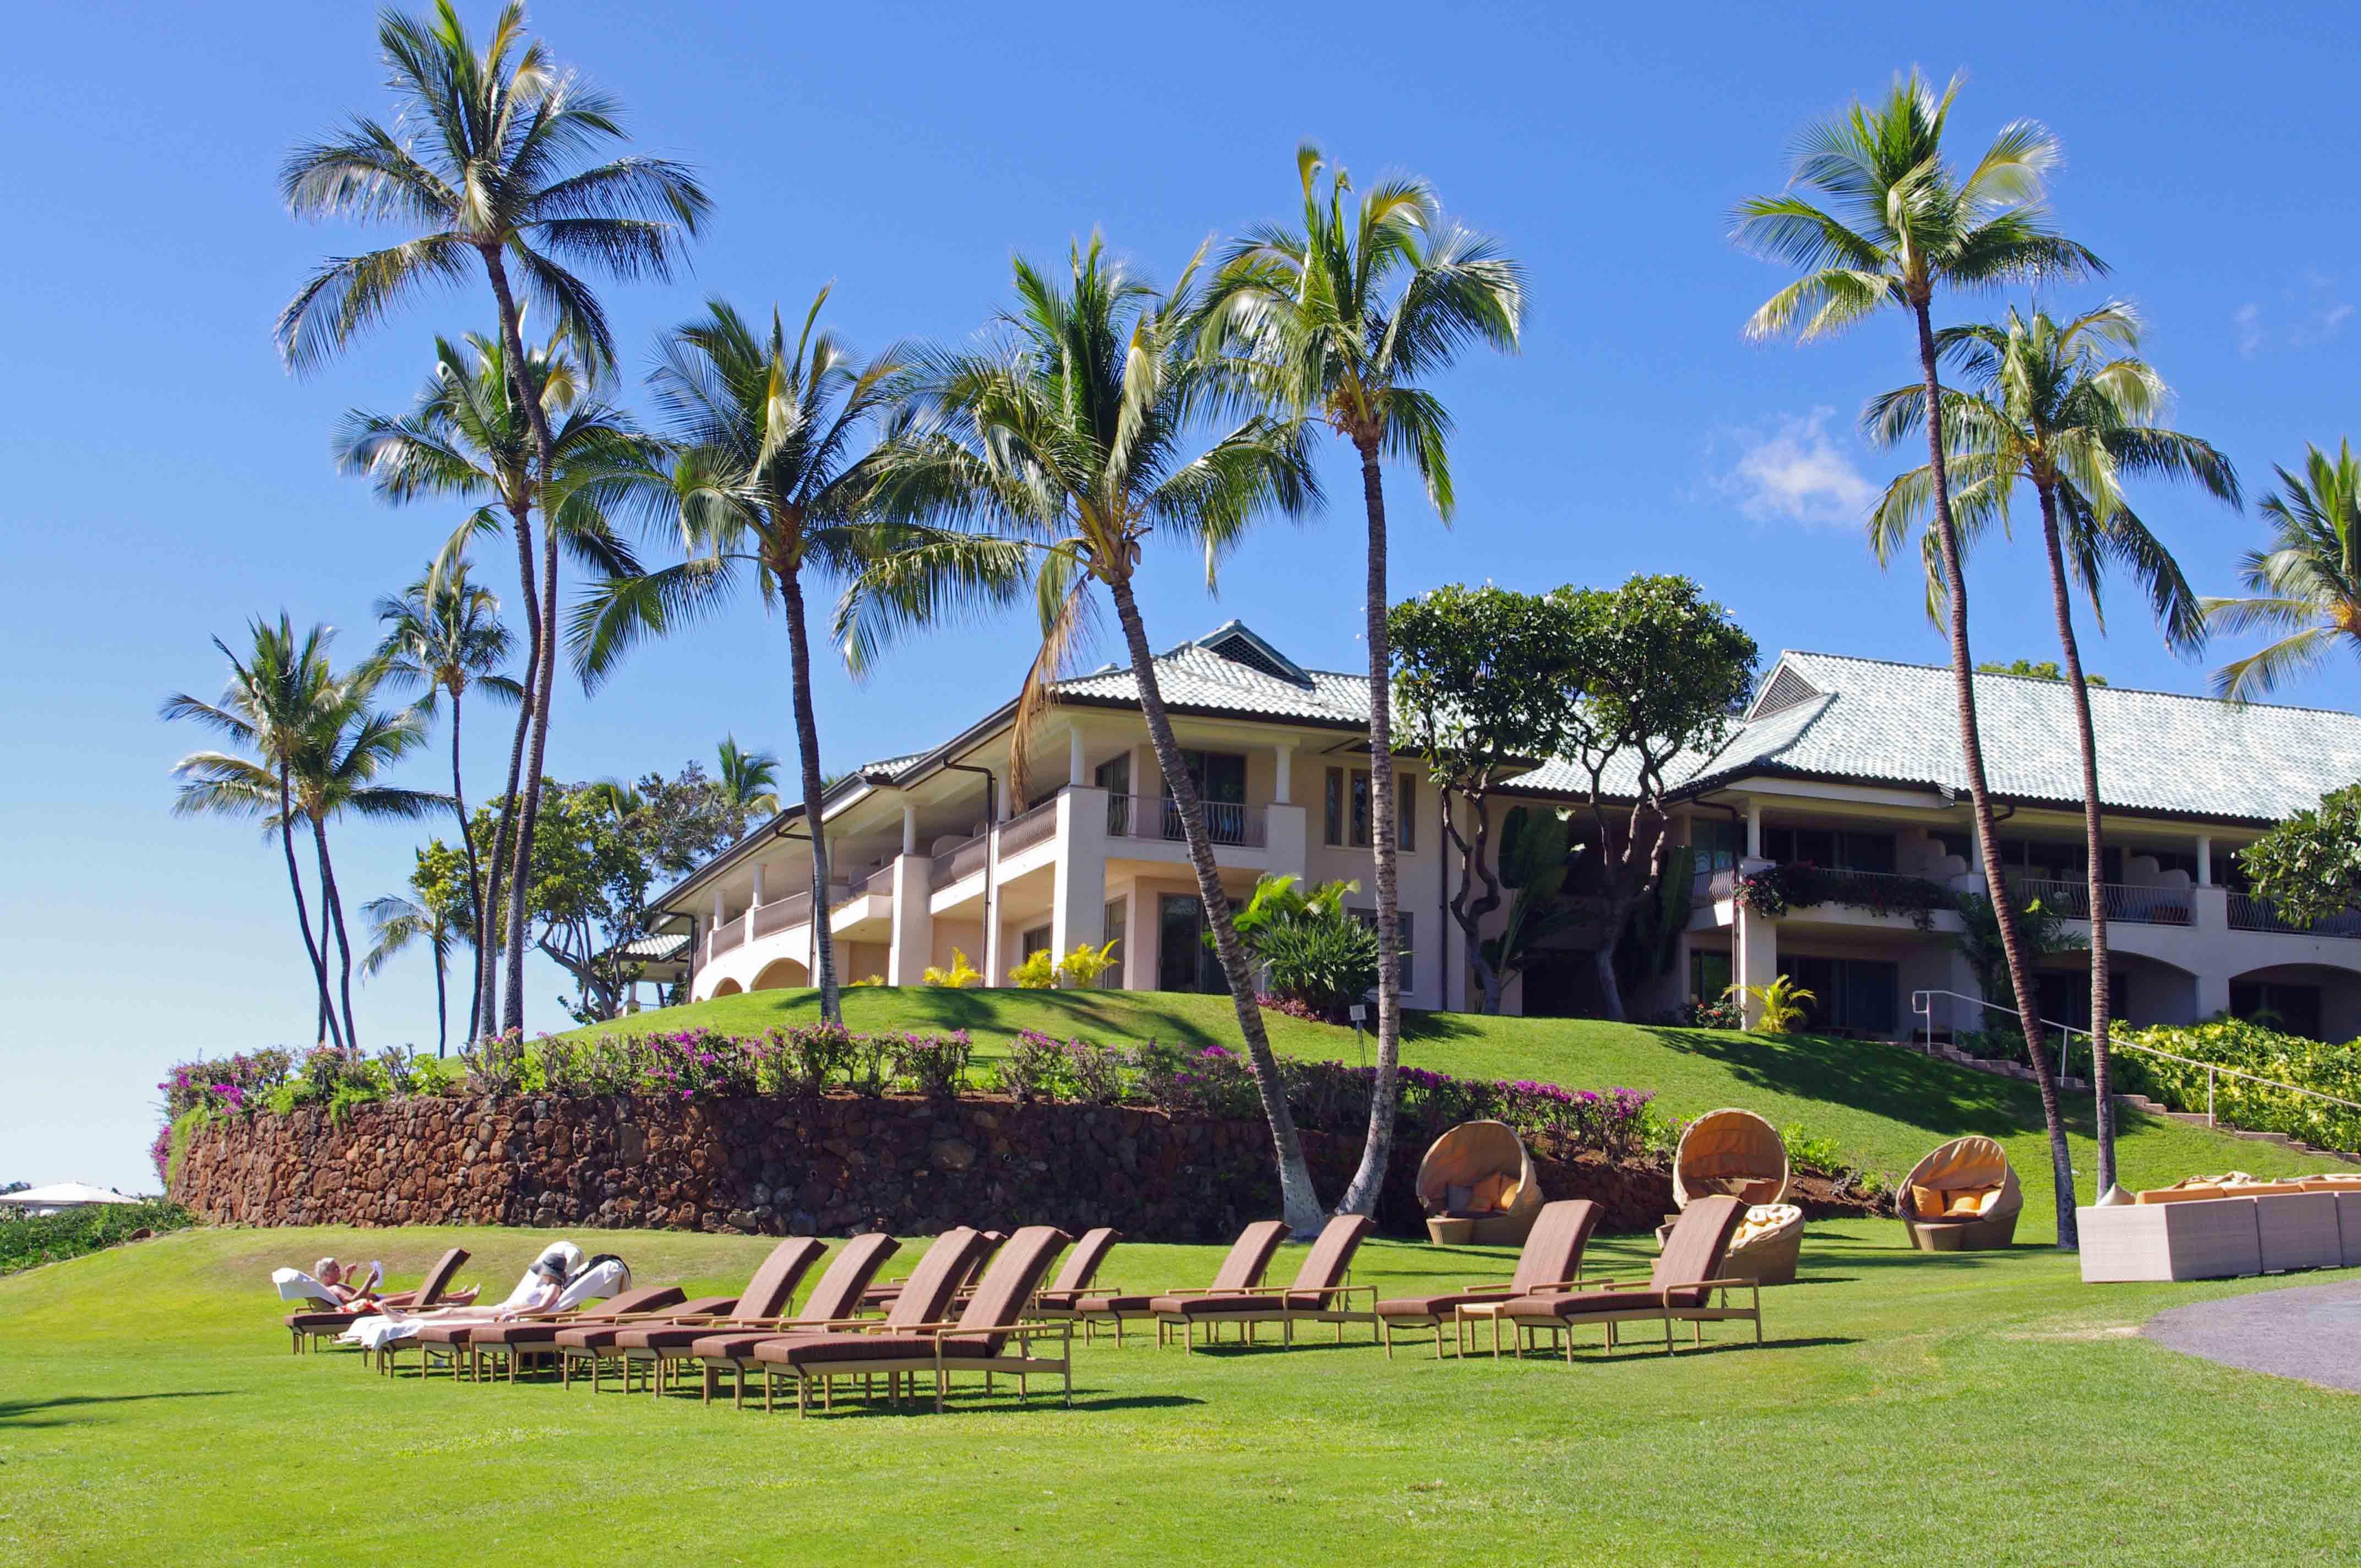 Golf lana 39 i hawaii for Lanai structure